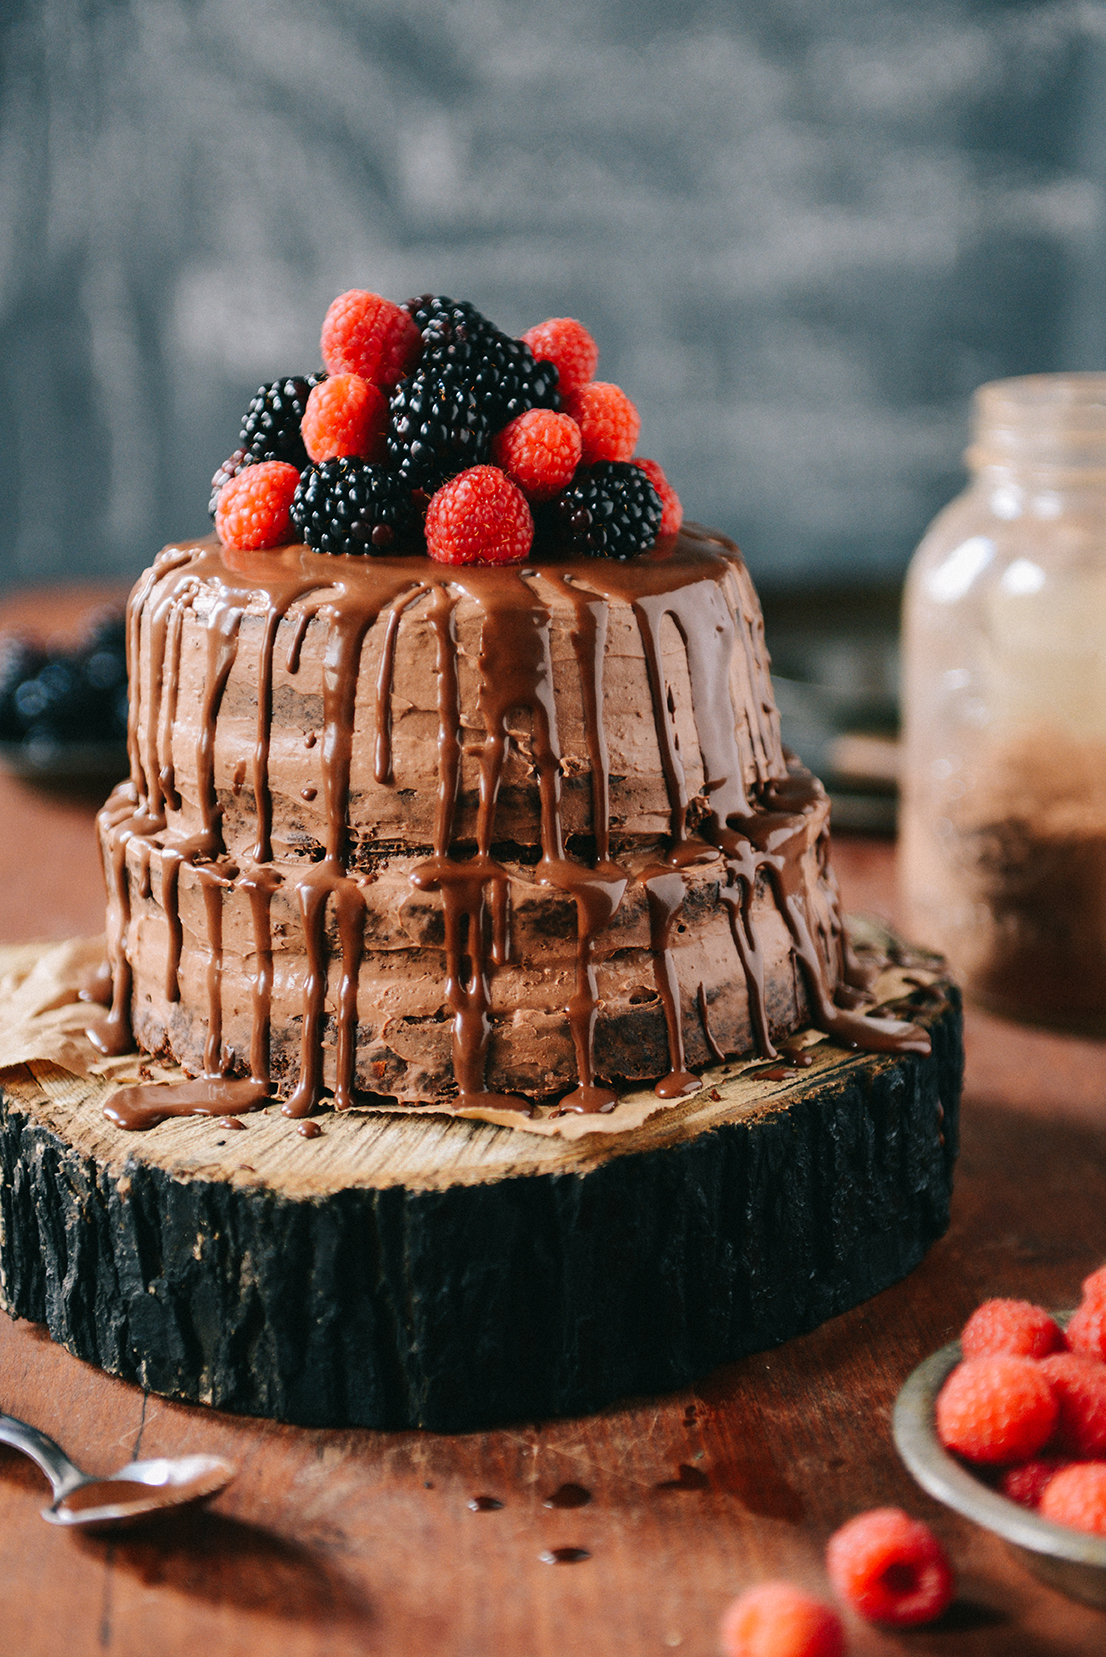 Whole Wheat Carob Apricot Cake with Chocolate Frosting & Chocolate Ganache